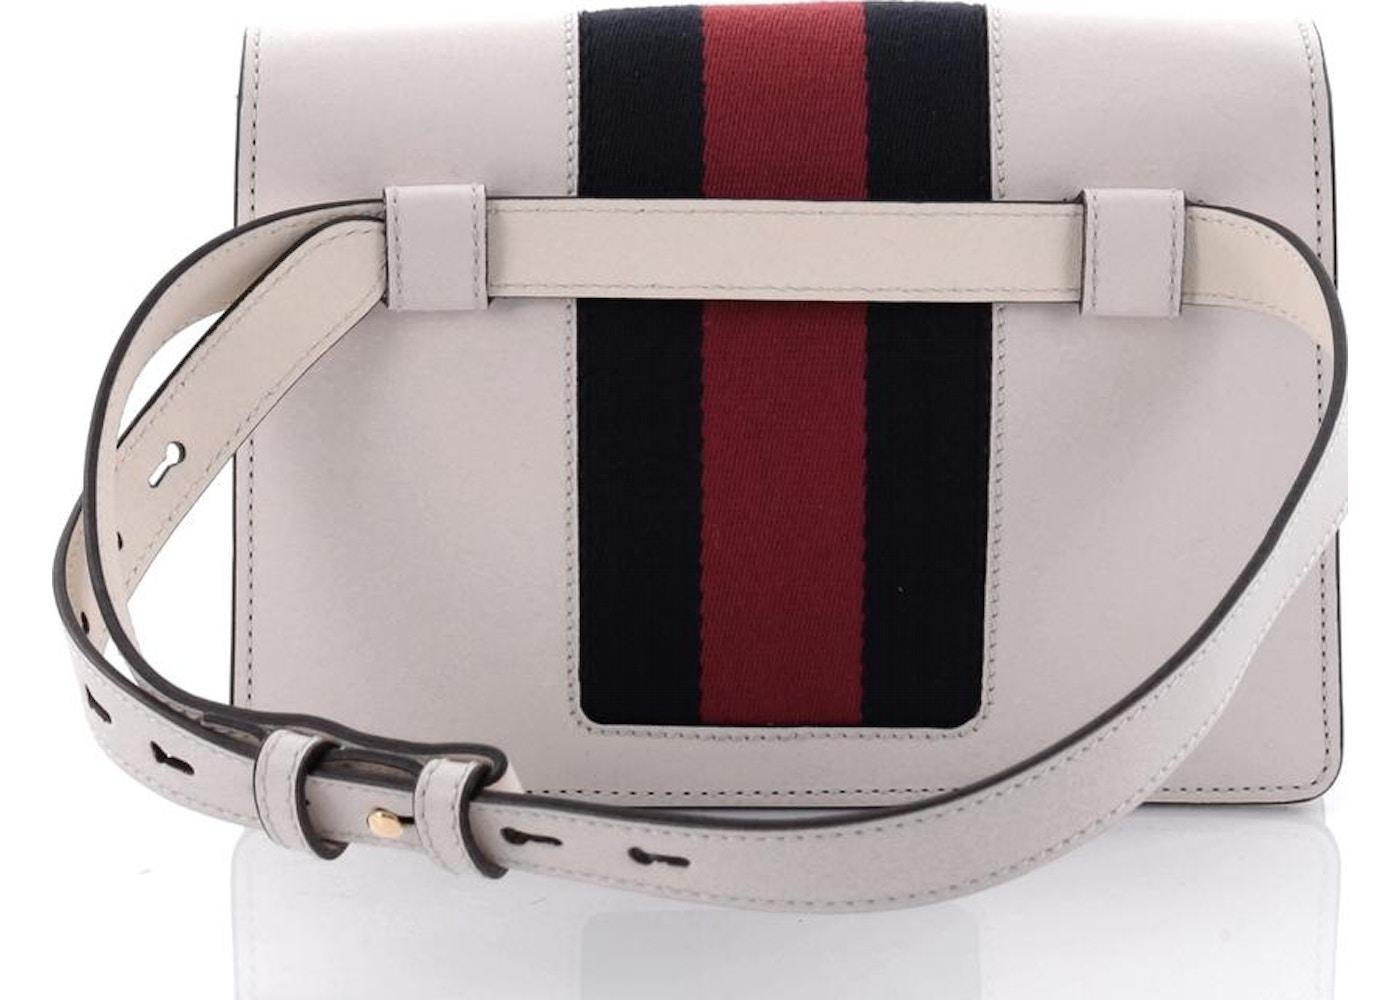 f020e70ca3da6e Gucci Sylvie Belt Bag Web White/Blue/Red